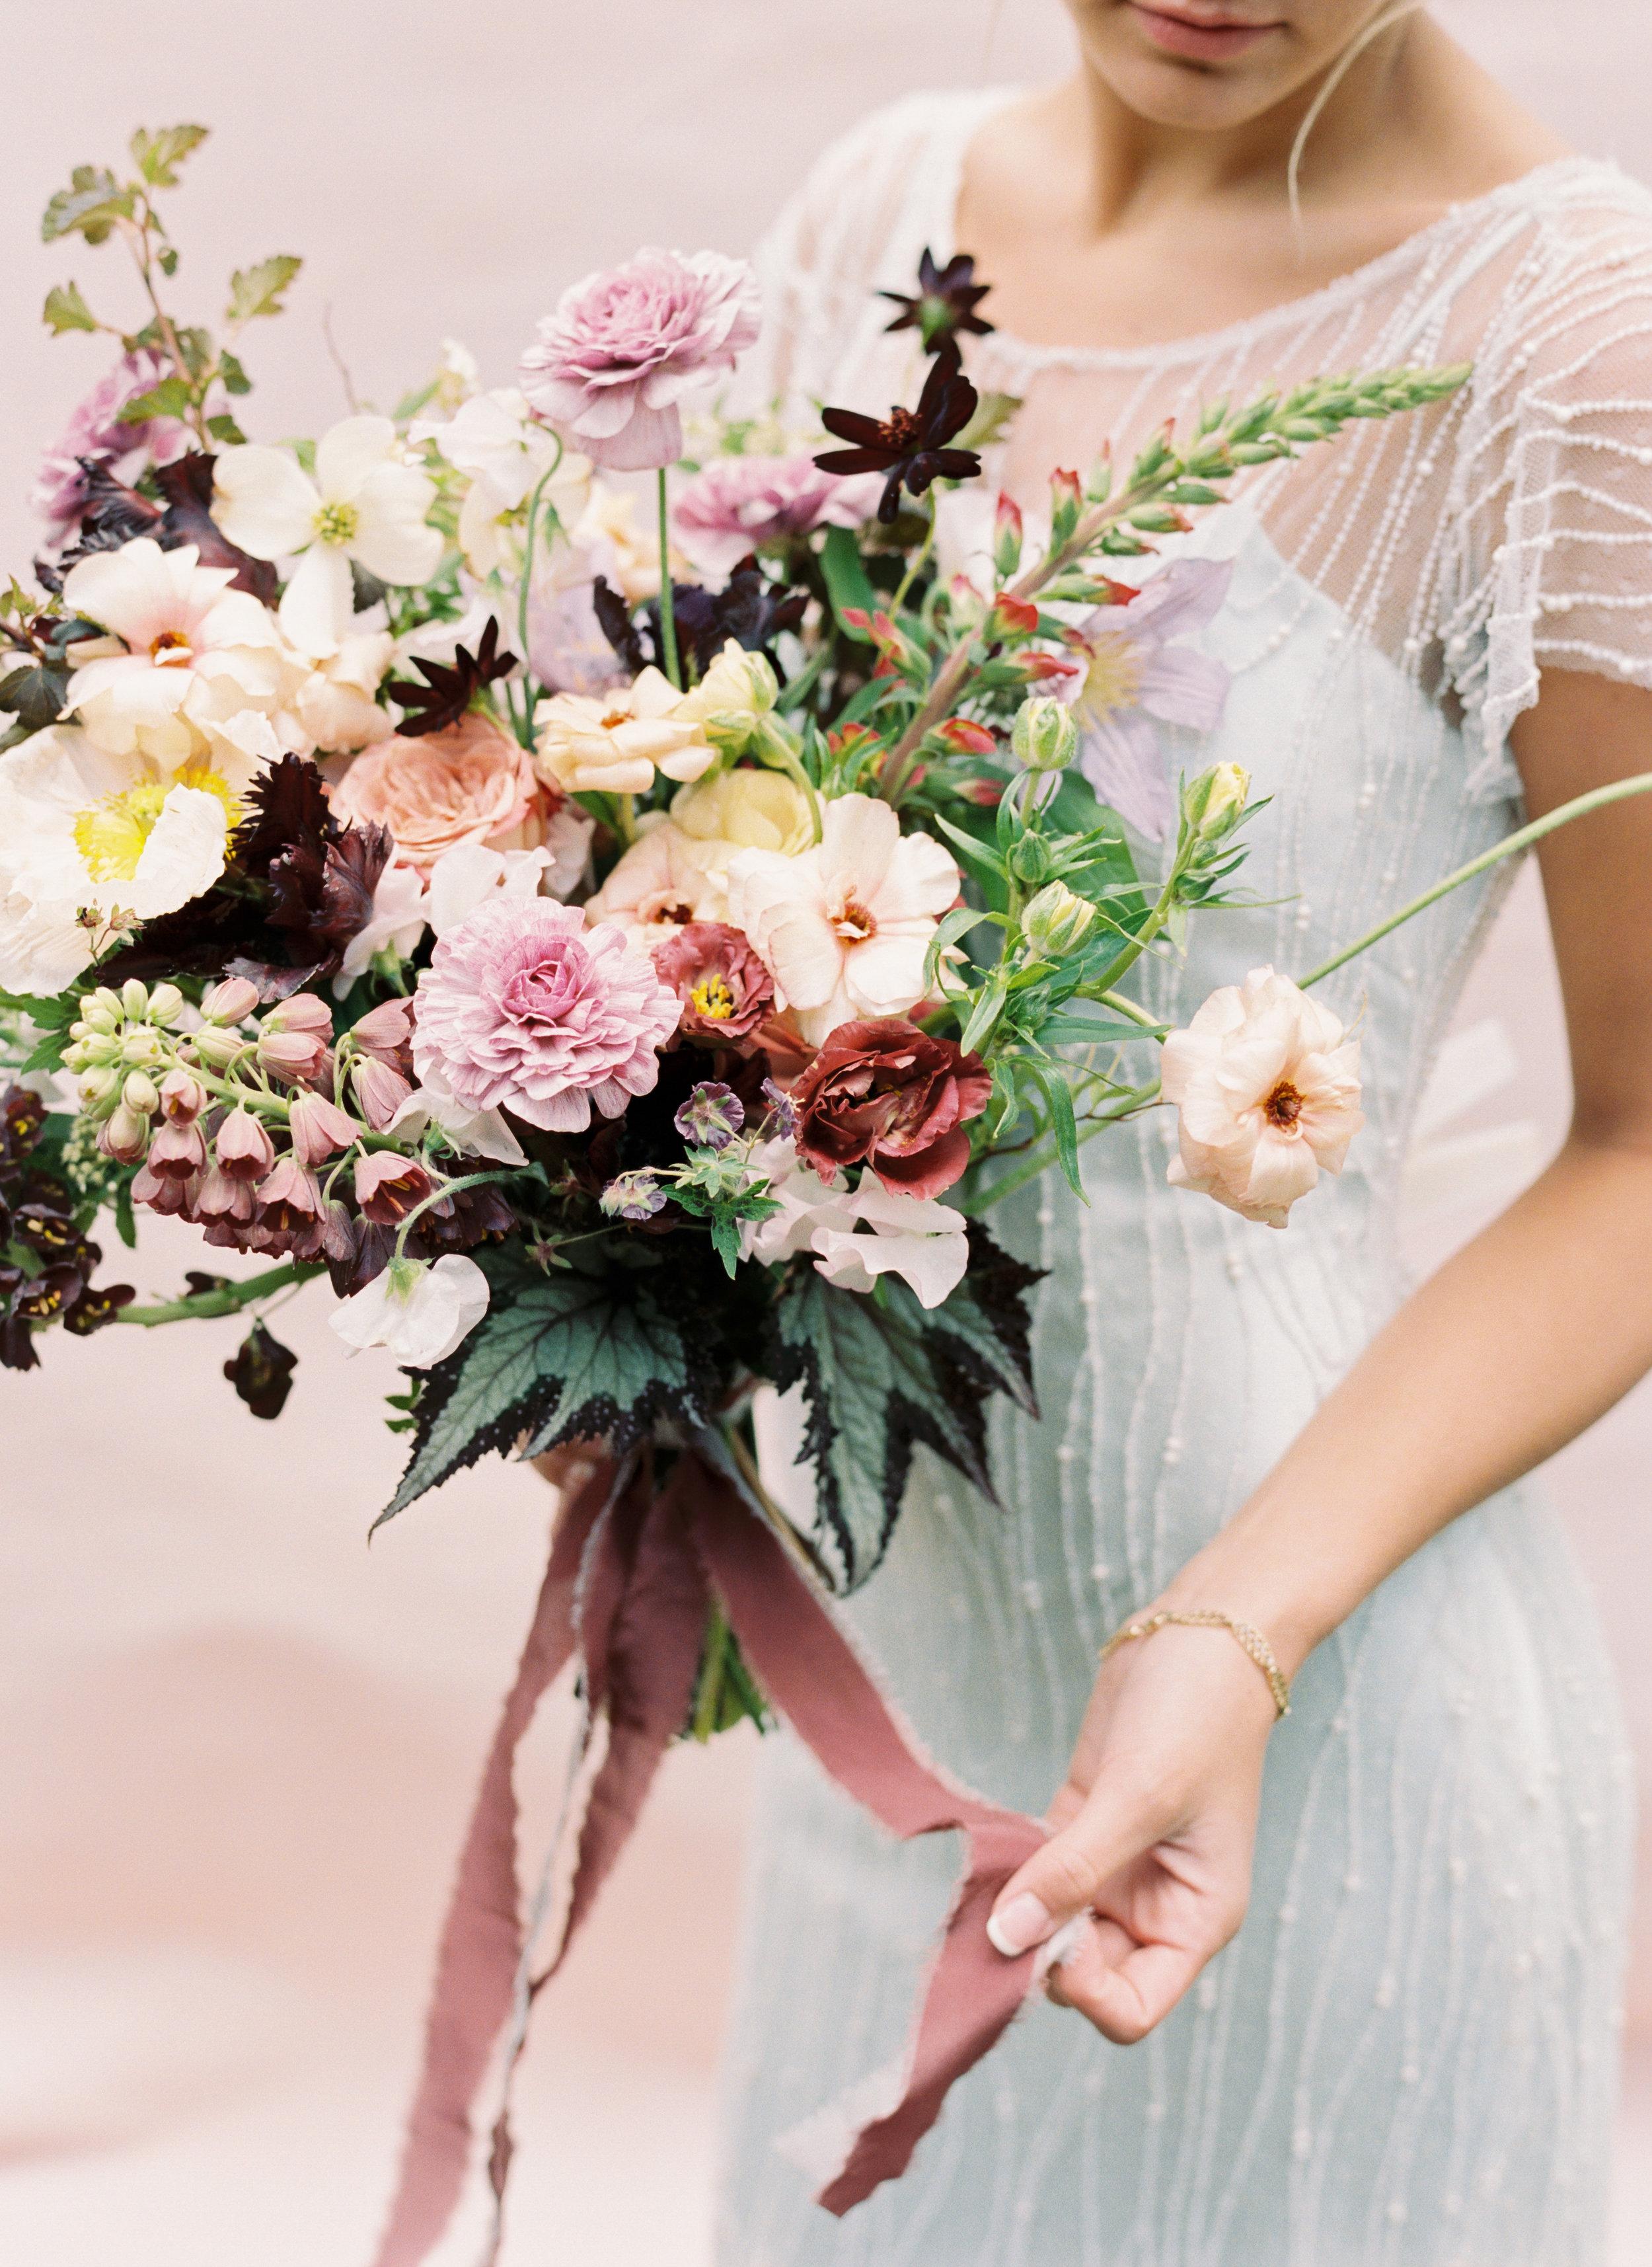 Pale blue wedding dress with lush, organic bridal bouquet. Nashville Wedding Florist.